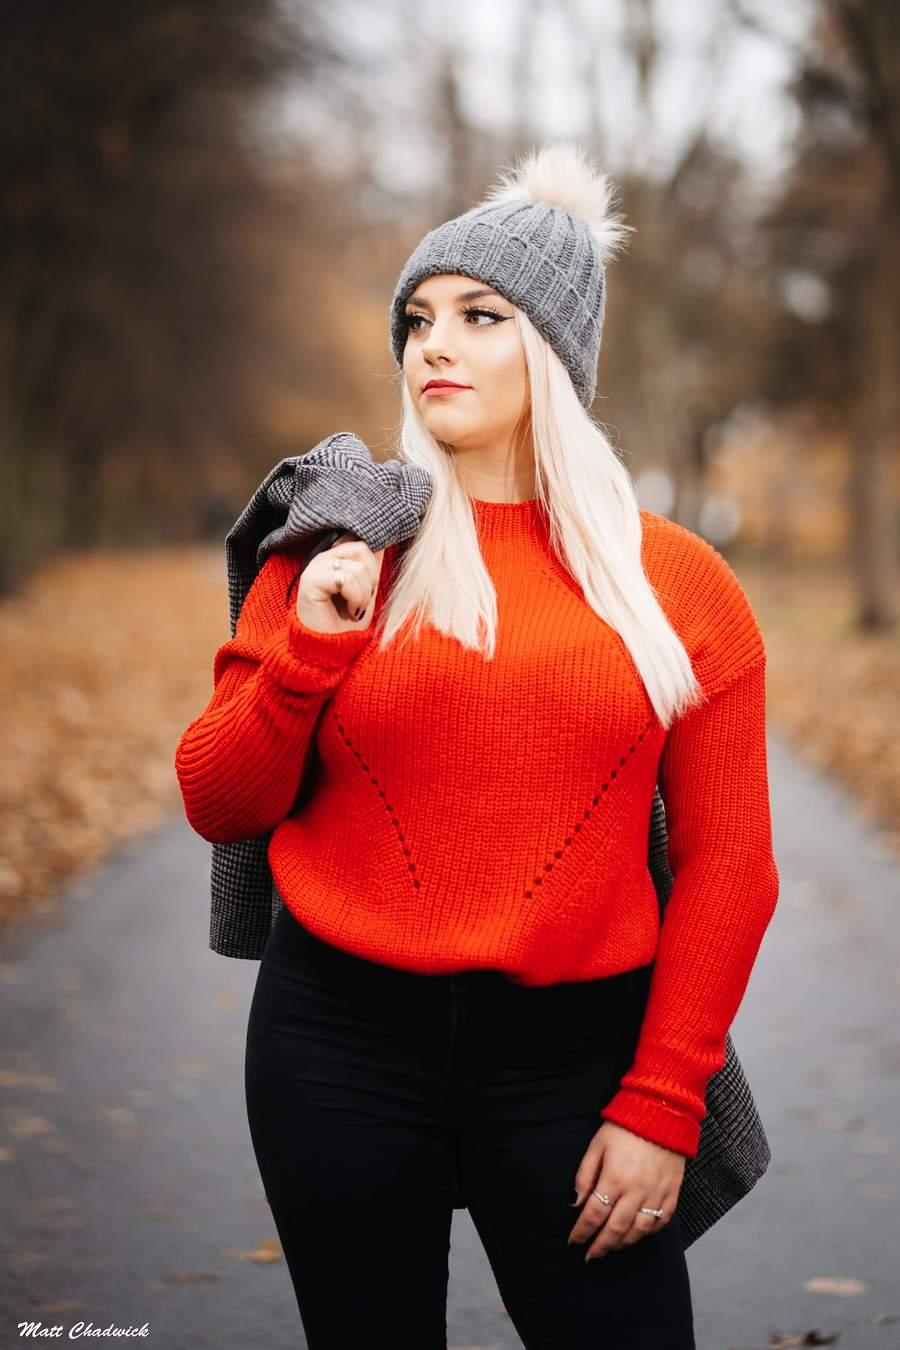 Photography by Matt Chadwick, Model Courtney Loraine / Uploaded 4th November 2019 @ 05:15 PM